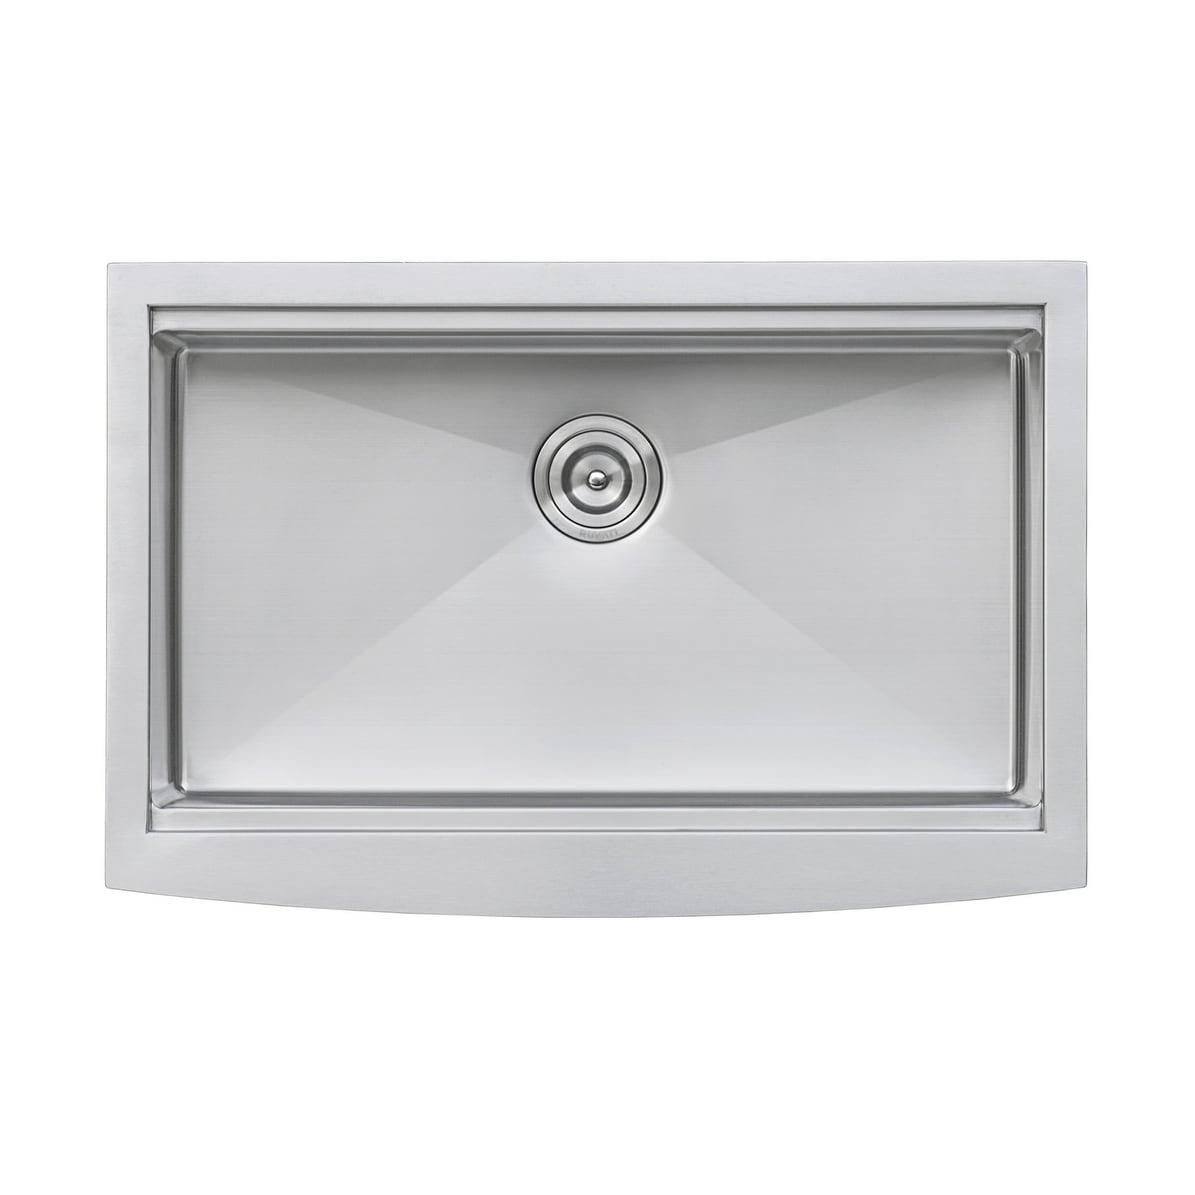 Ruvati 30-inch Apron-front Workstation Farmhouse Kitchen Sink 16 ...